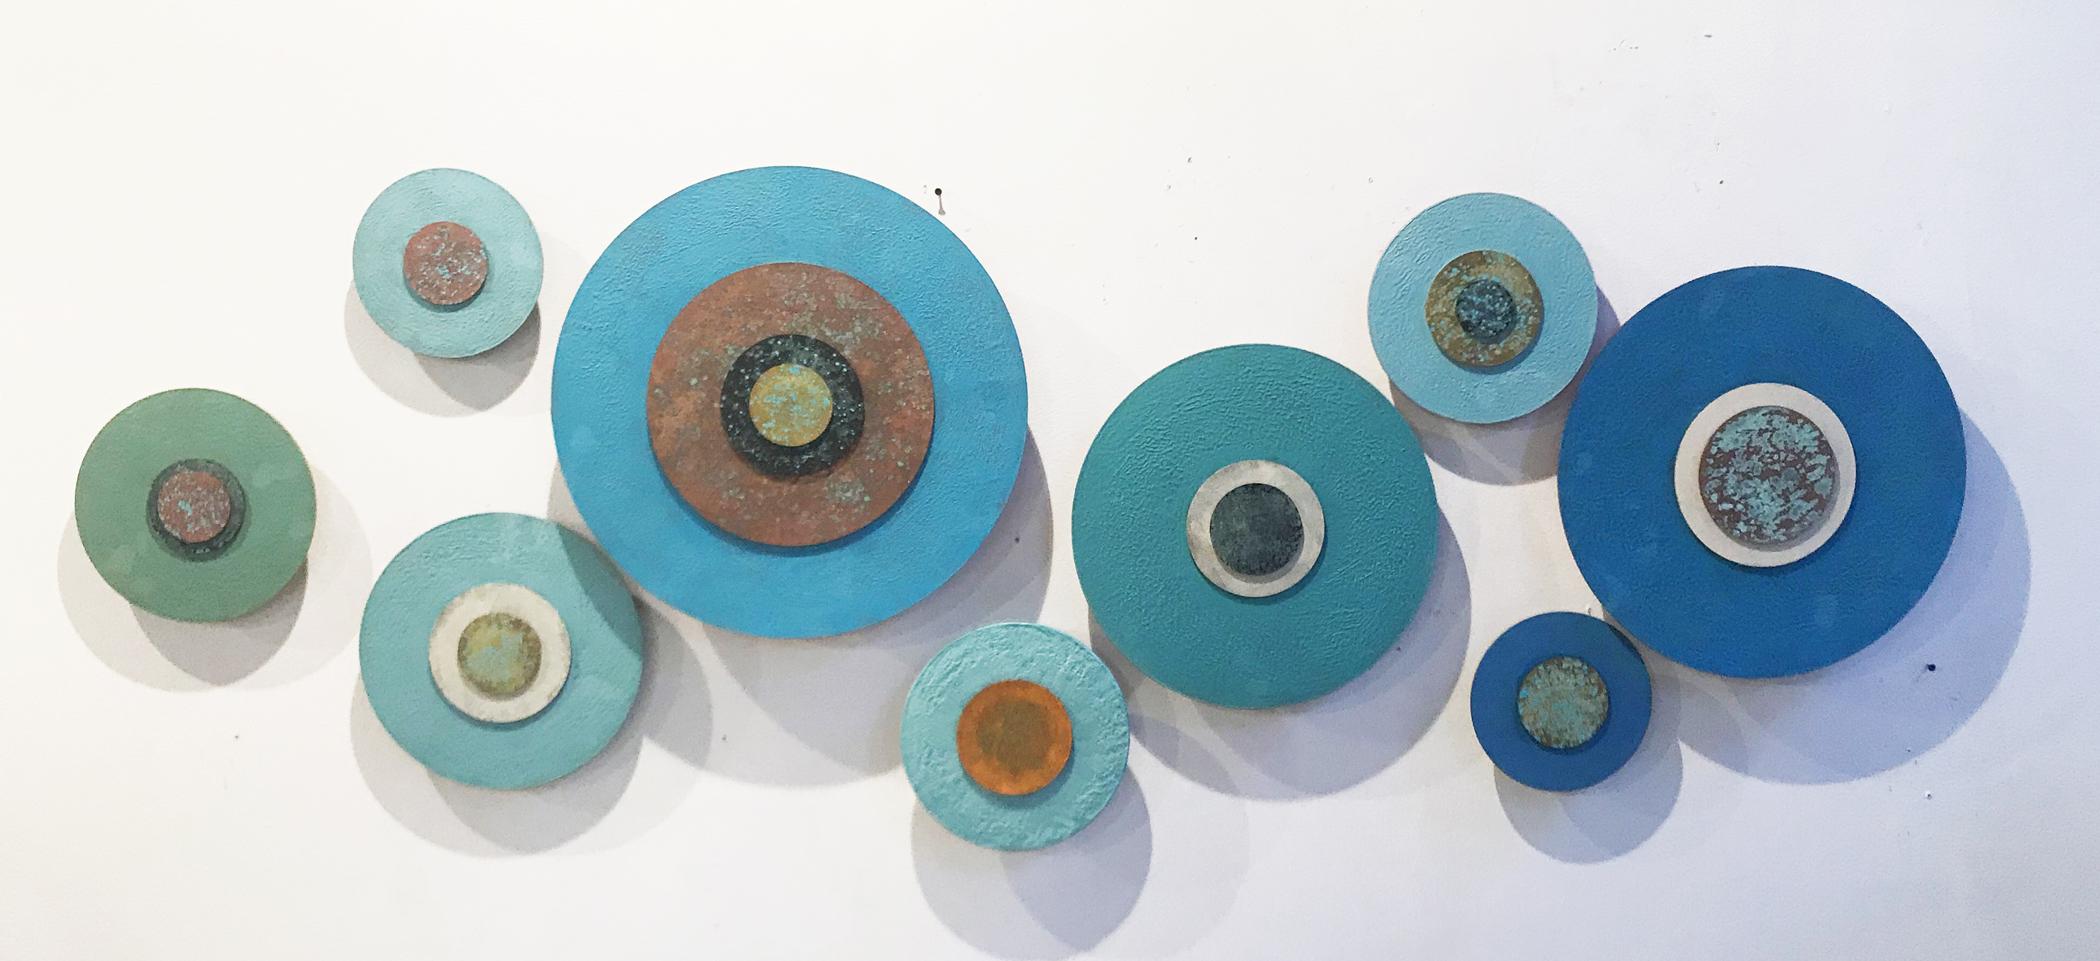 Kolman & Pryor Gallery_Jodi Reeb_True Blue Series_2019__encaustic and metallic paint on acrylic disk_32 x 80 x 2 inches_�5925.jpg